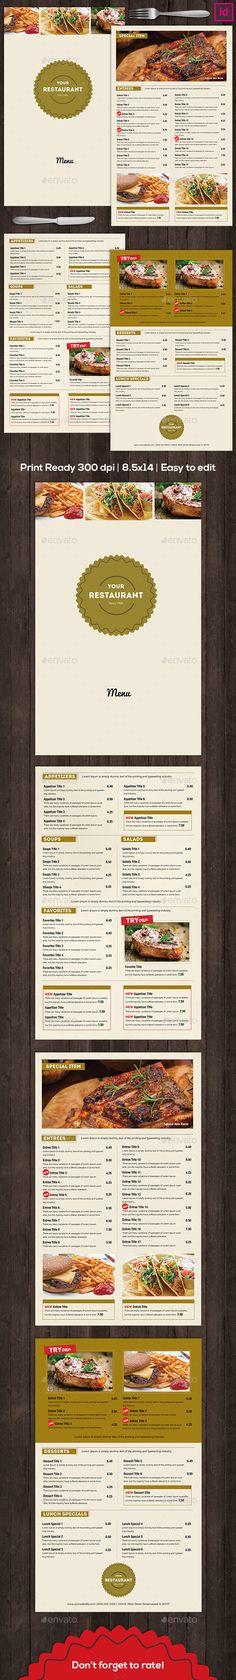 Restaurant Food Menu Versatile Template #design Download: http://graphicriver.net/item/restaurant-food-menu-versatile/9768185?ref=ksioks